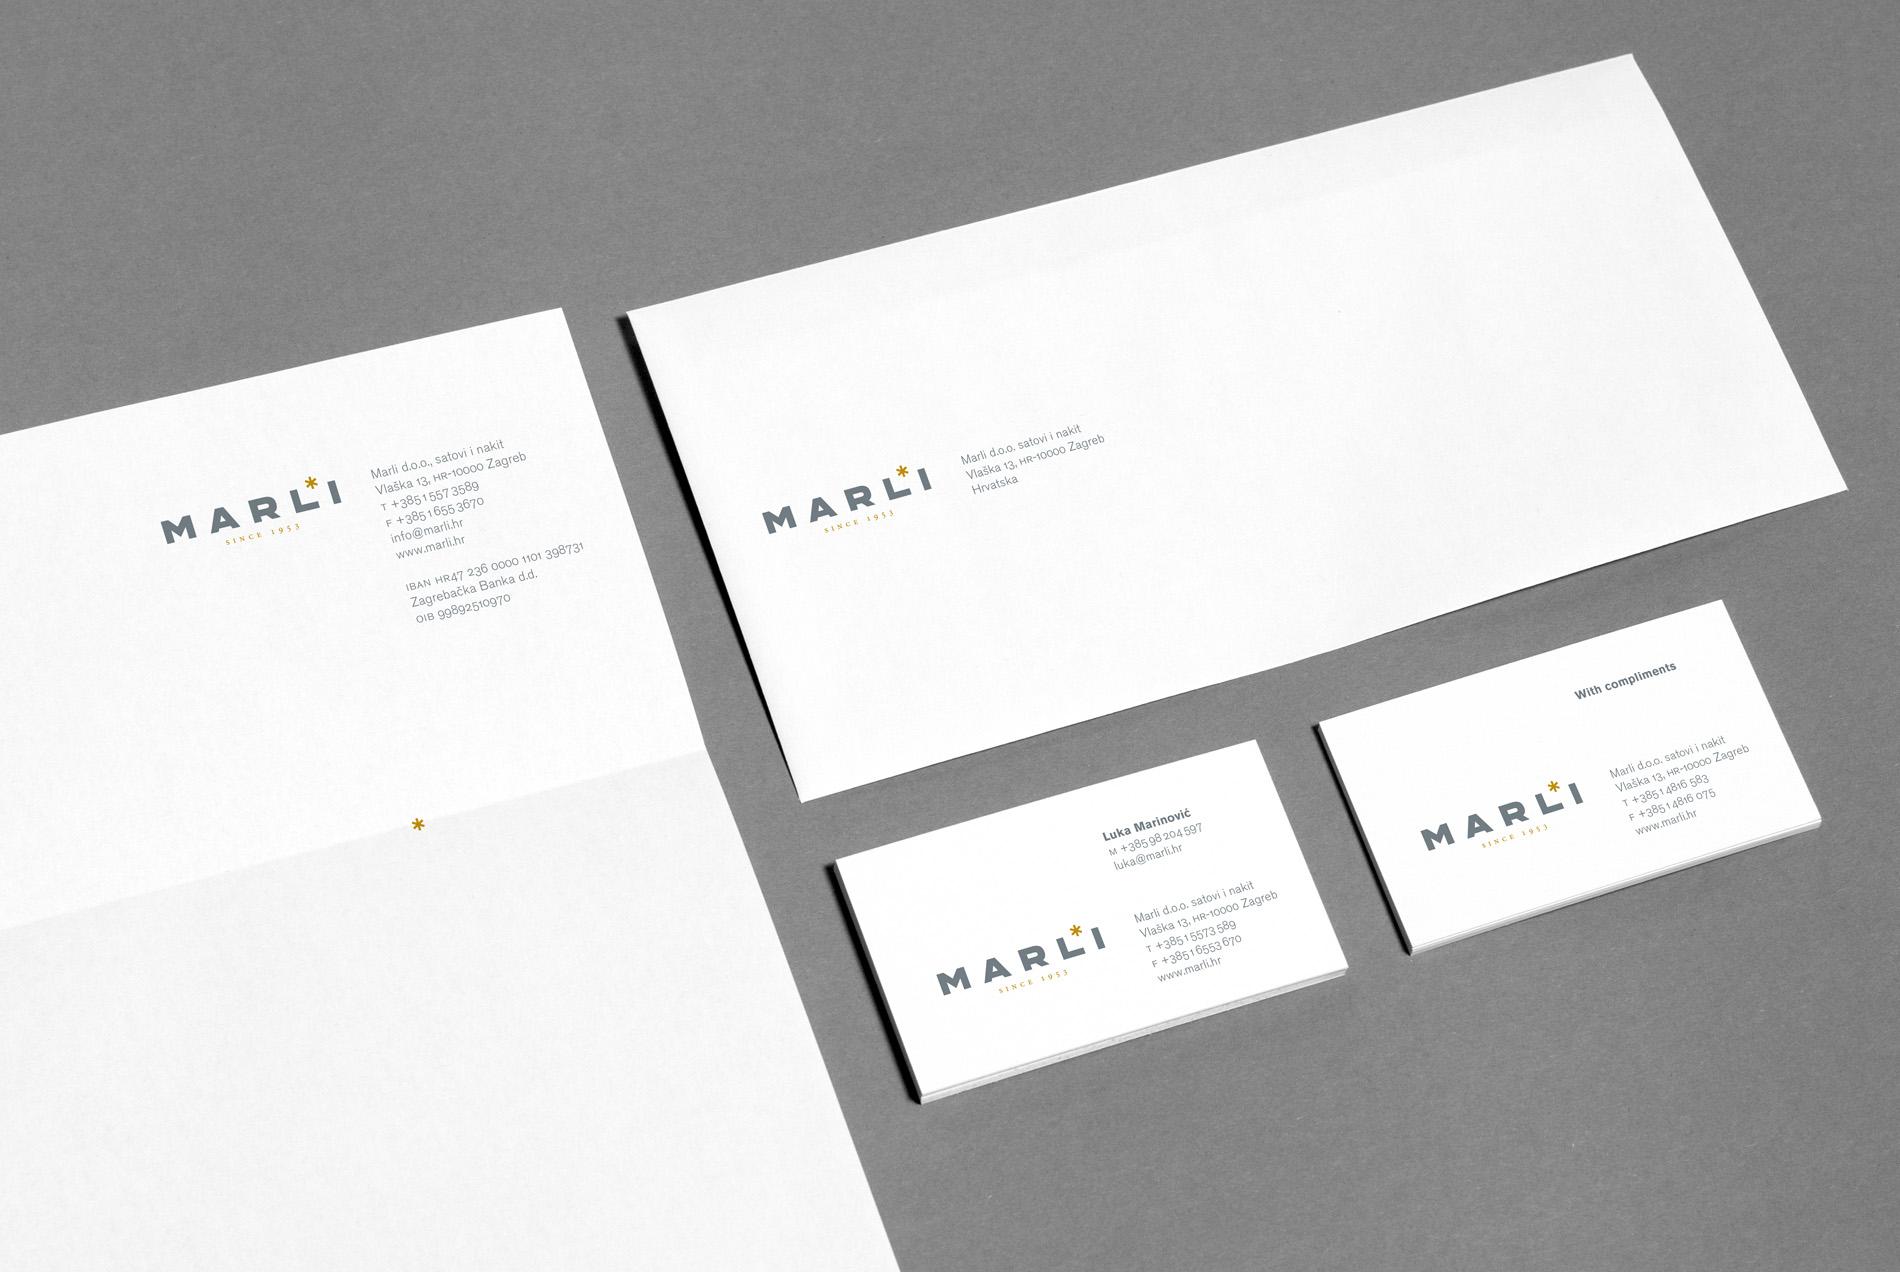 Marli Korzinek Dizajn